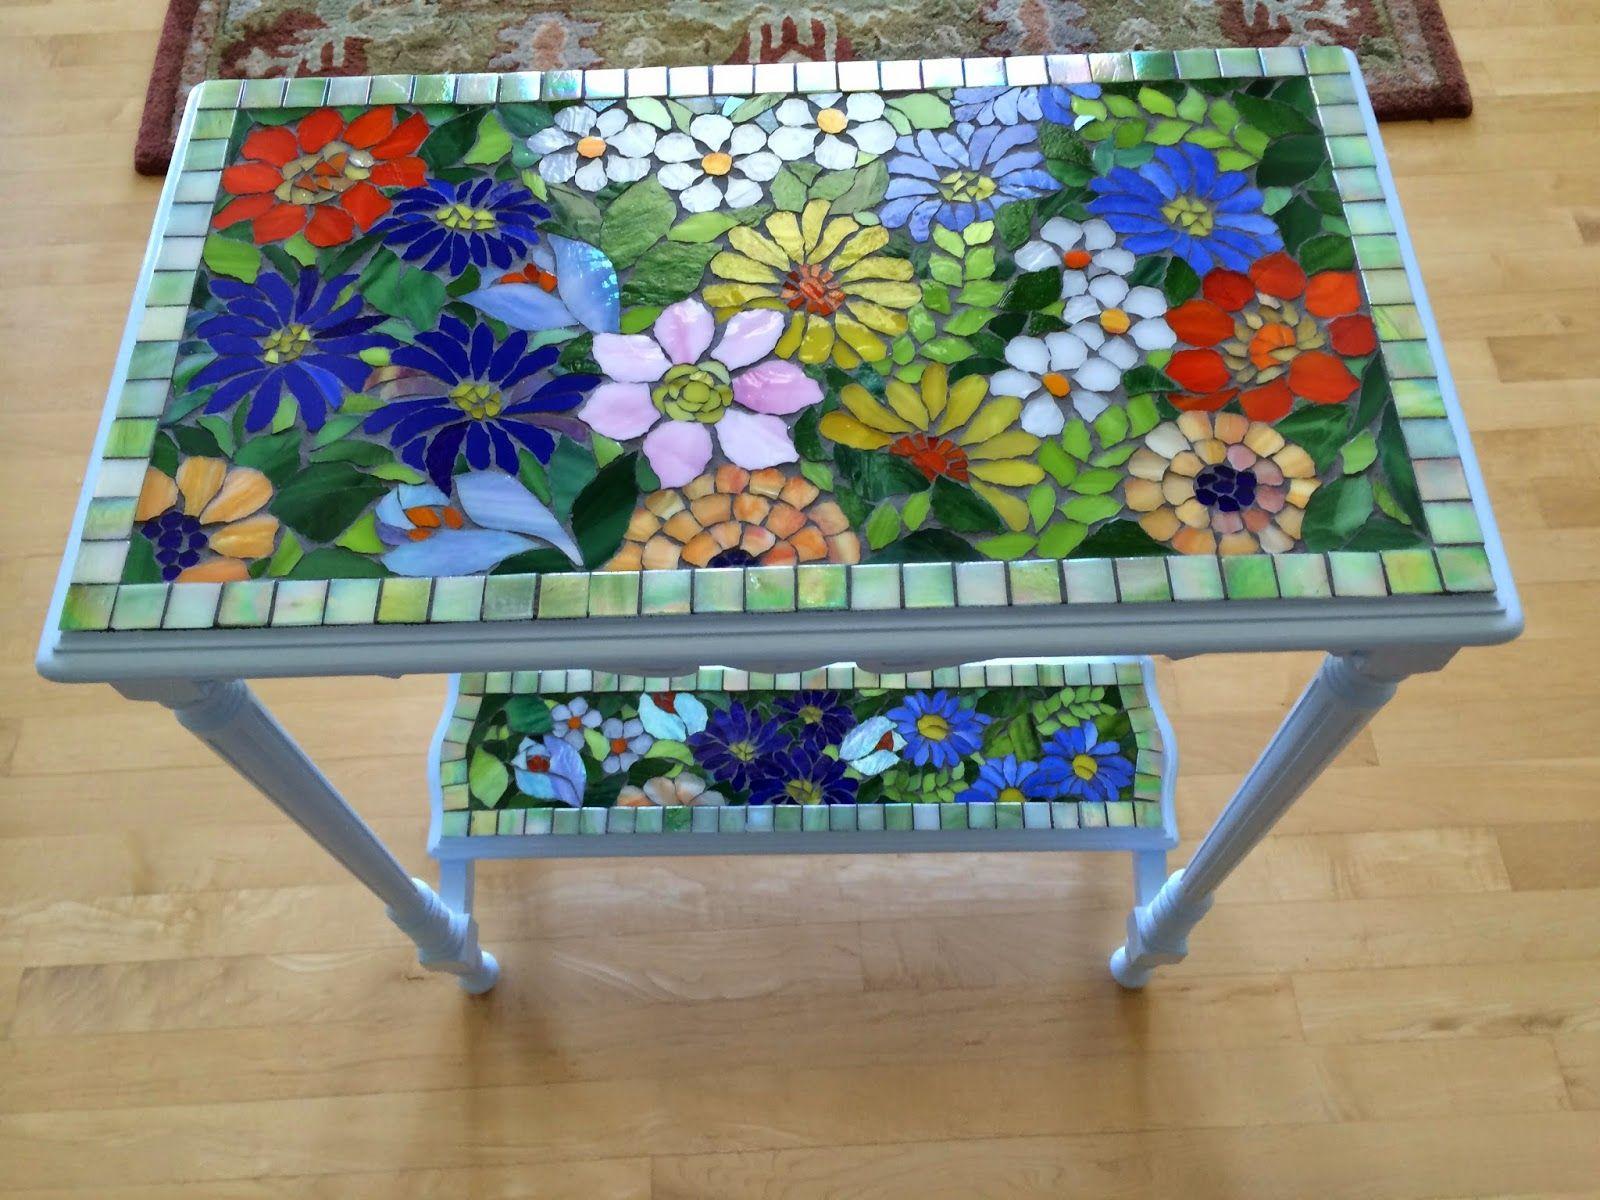 Tropical Pool Table Jpg 1 600 200 Pixels Mosaic Furniture Free Patterns